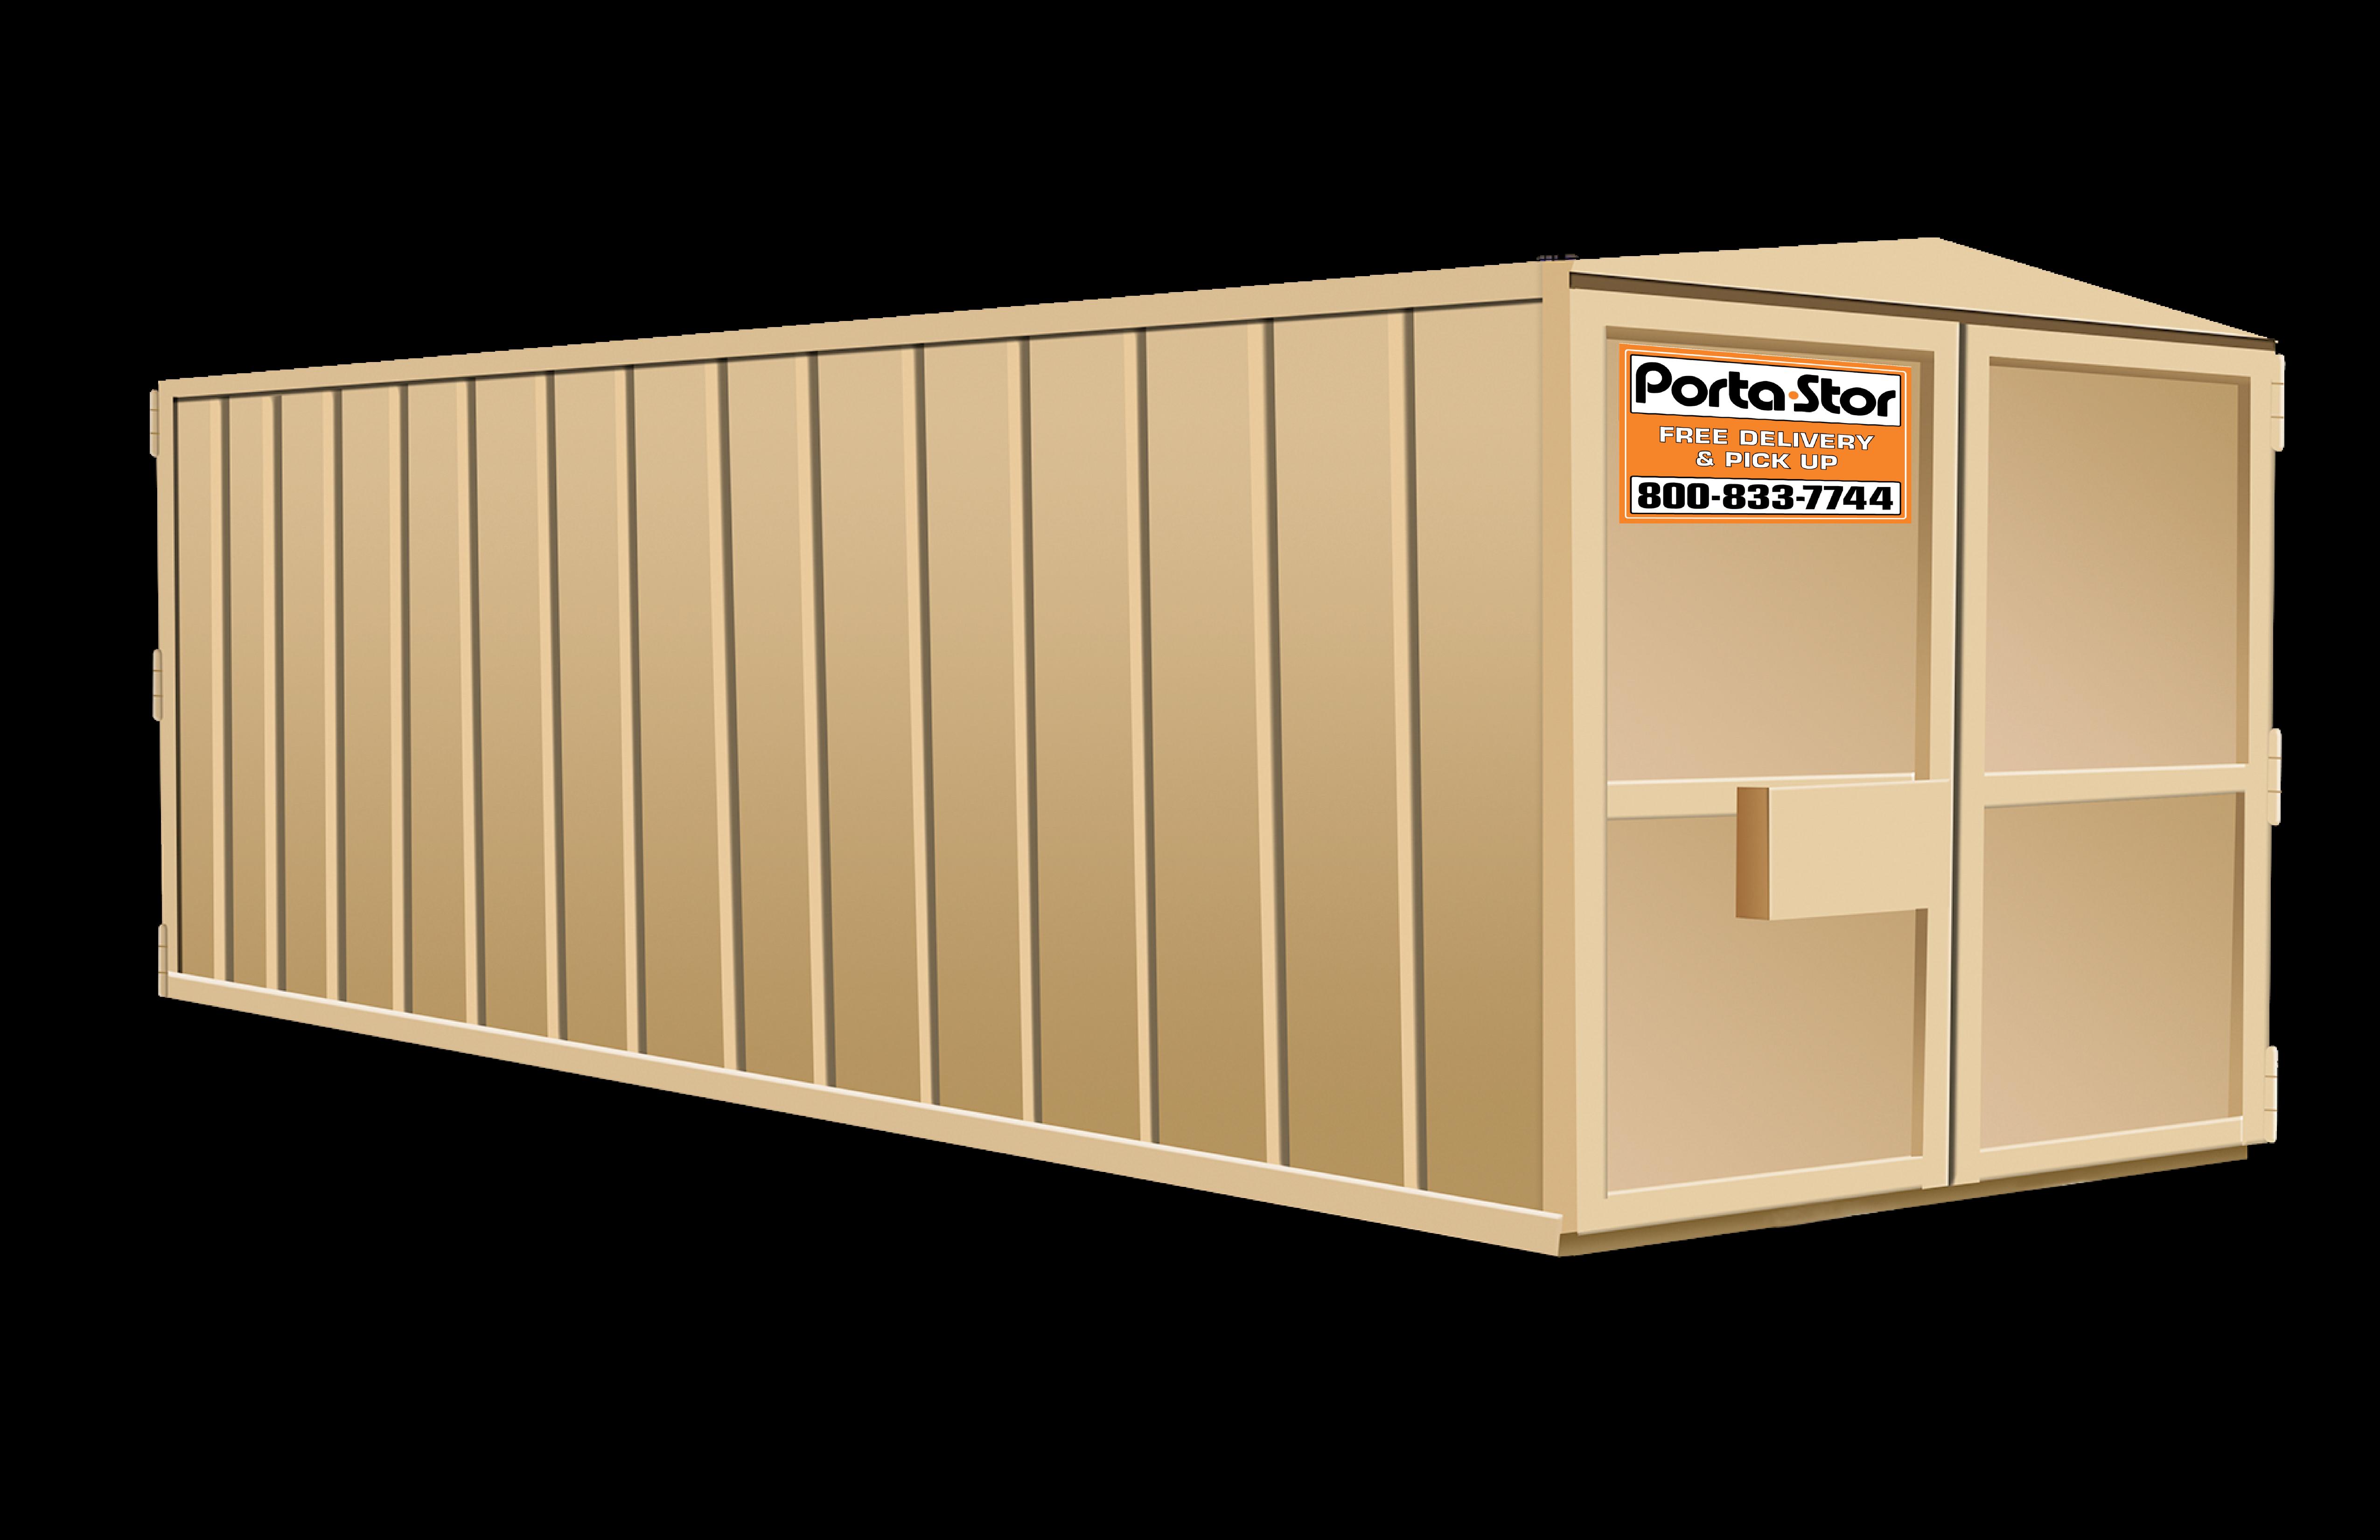 PortaStor26-06 (1)